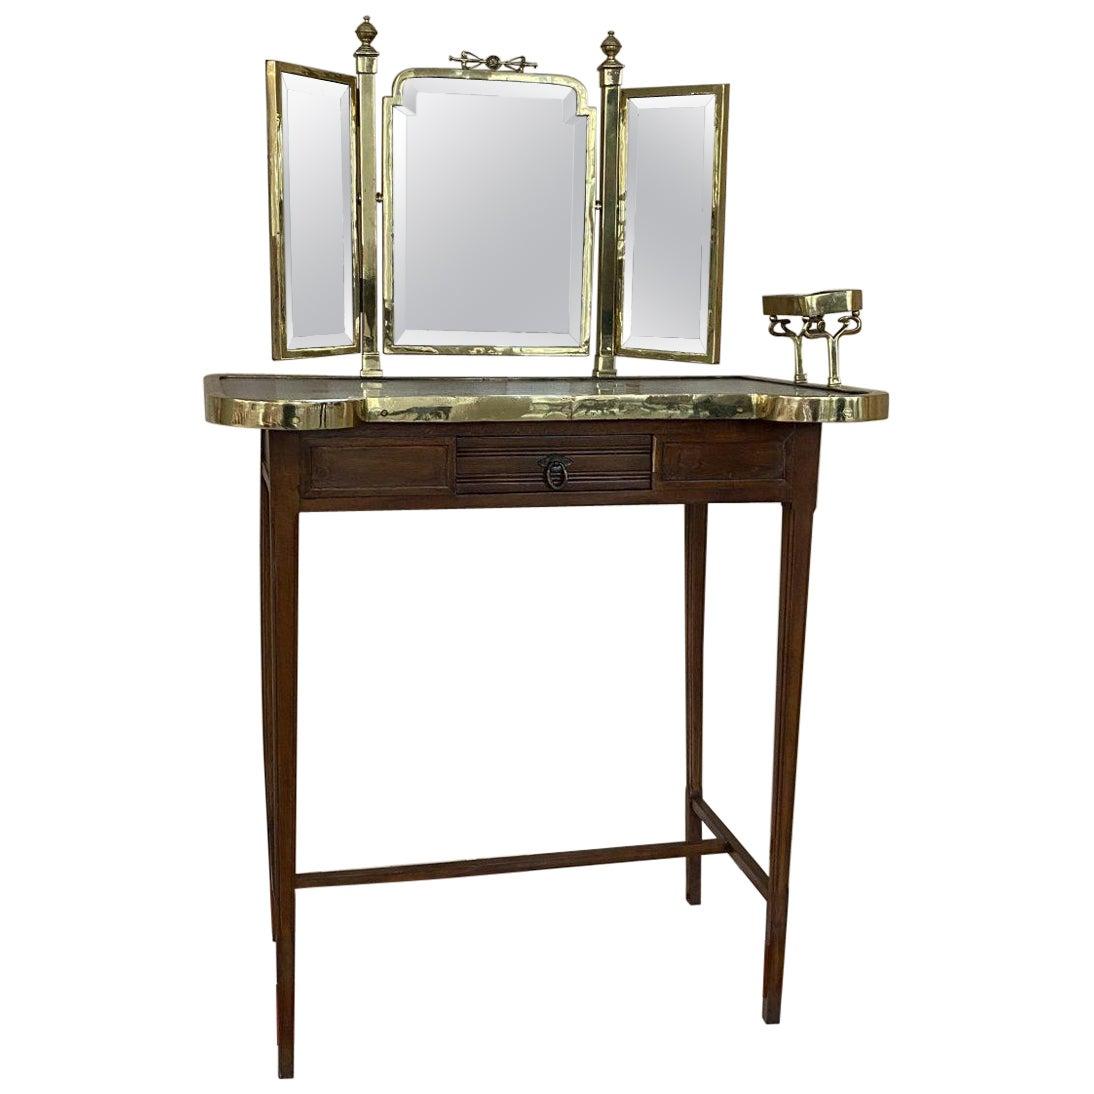 Dressing Table / Vanity, 1920s France